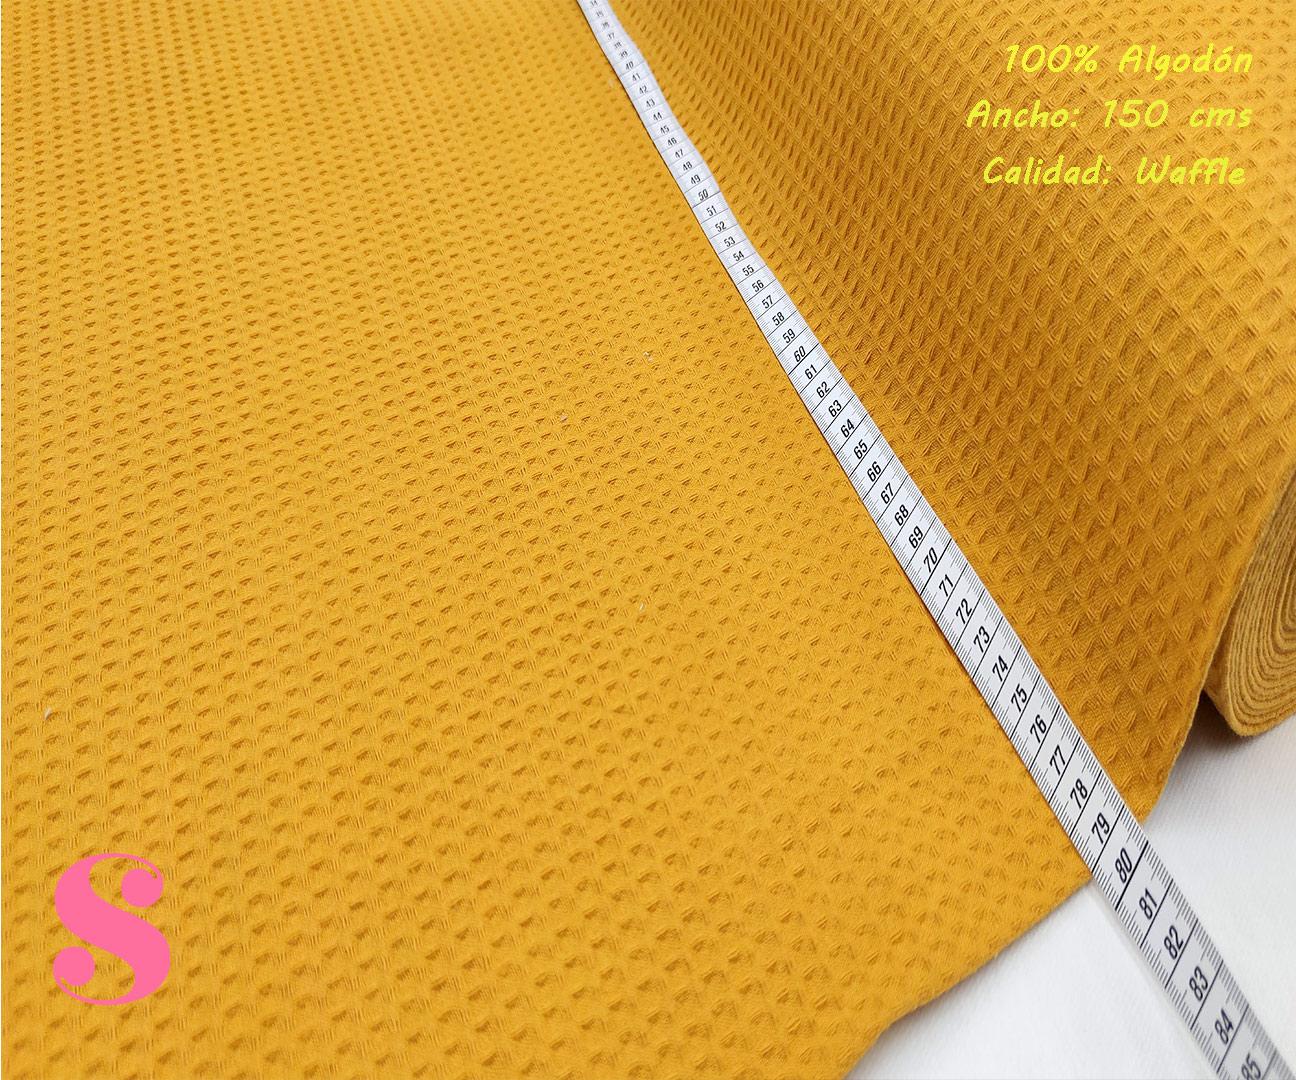 W7-waffle-tela-invierno-toalla-relieve-cuadros-gofre-algodon,Wafel Cuadrados Mostaza